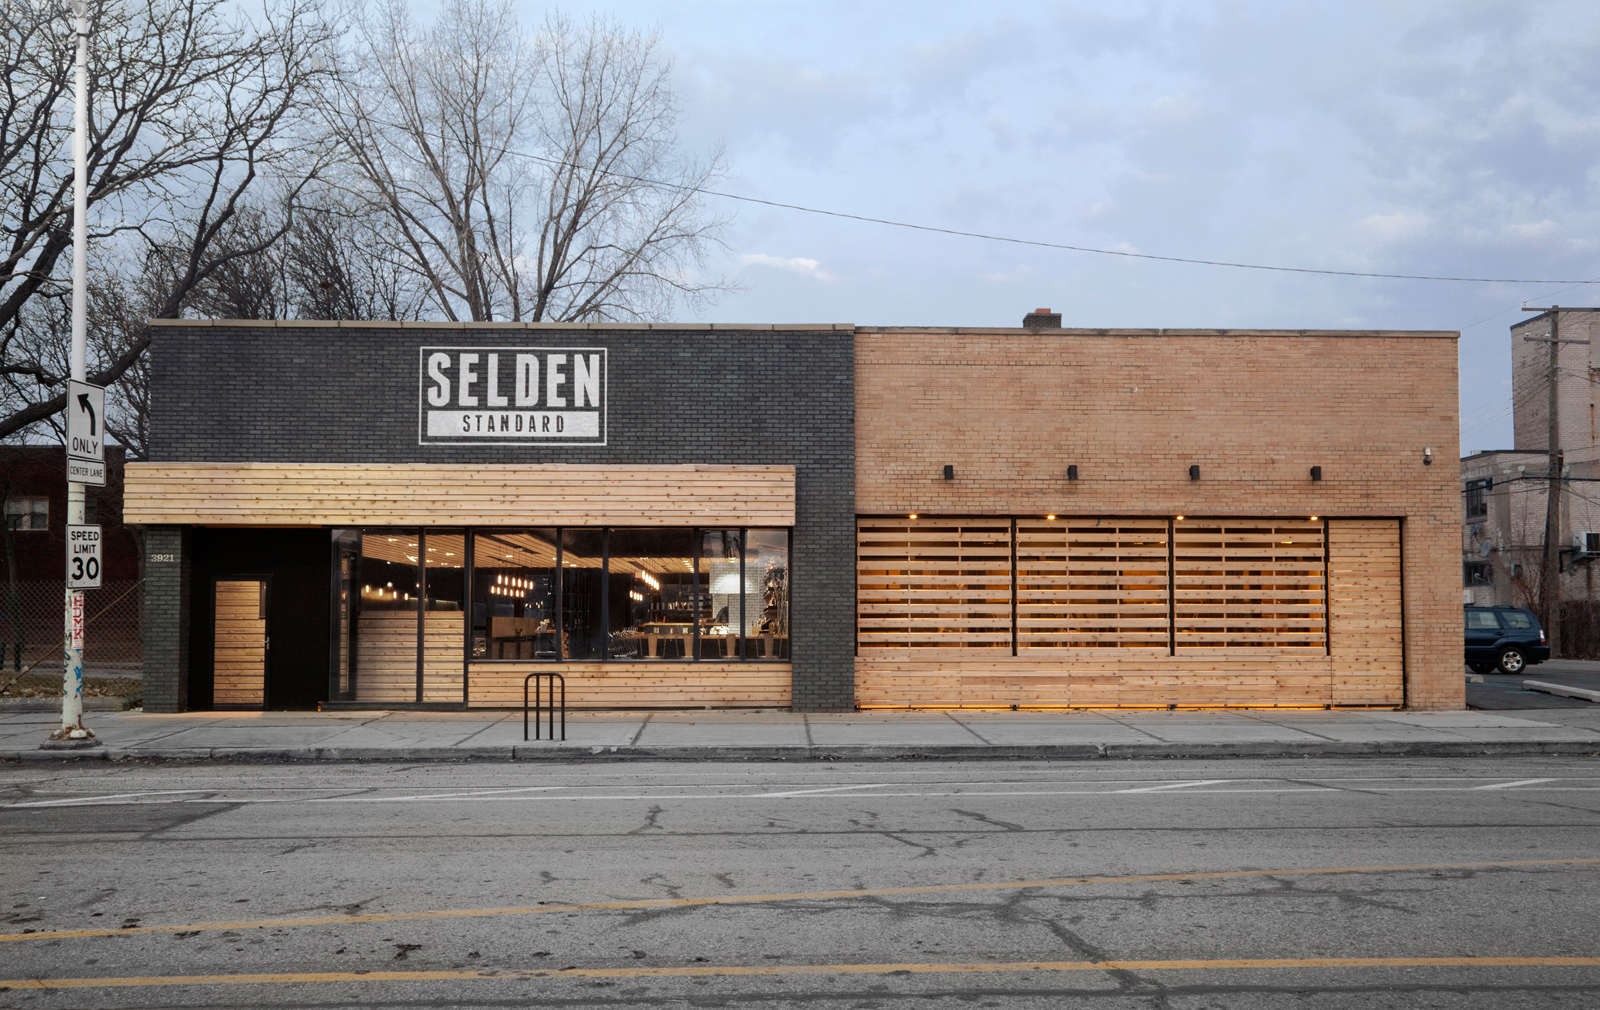 Selden Standard restaurant. Photography: PD Rearick